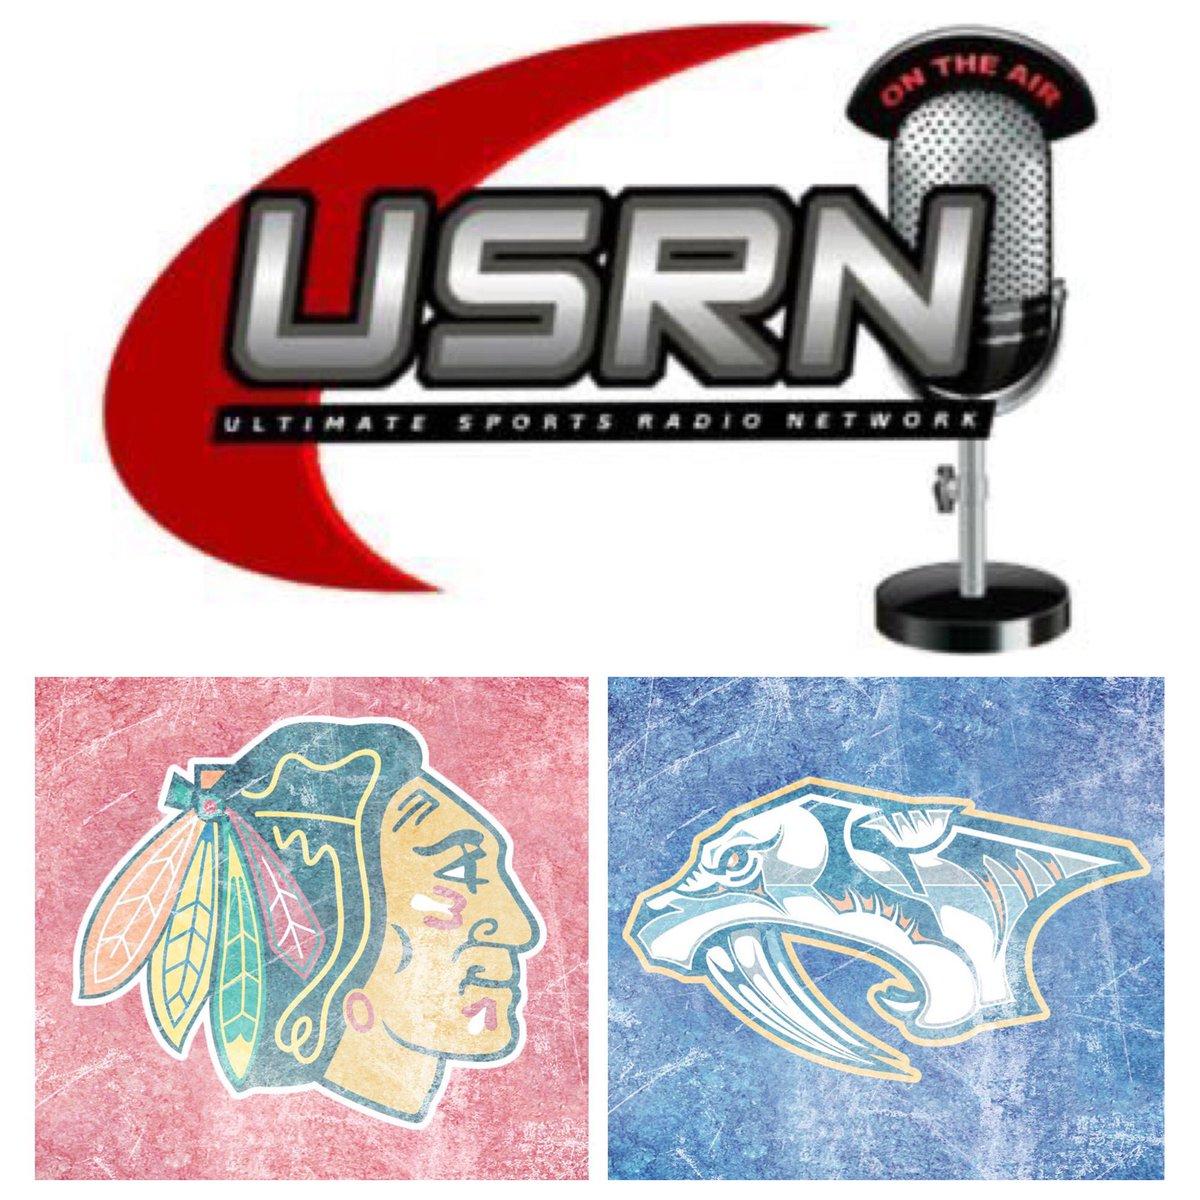 Next Up: WED 1/27 4:30pm PST/7:30pm EST Live Call: #NHL: #Blackhawks @ #Predators on #USRN2 #CHIvsNSH #Blackhawks#Preds #USRN #UltimateSportsRadioNetwork @USRNRadio